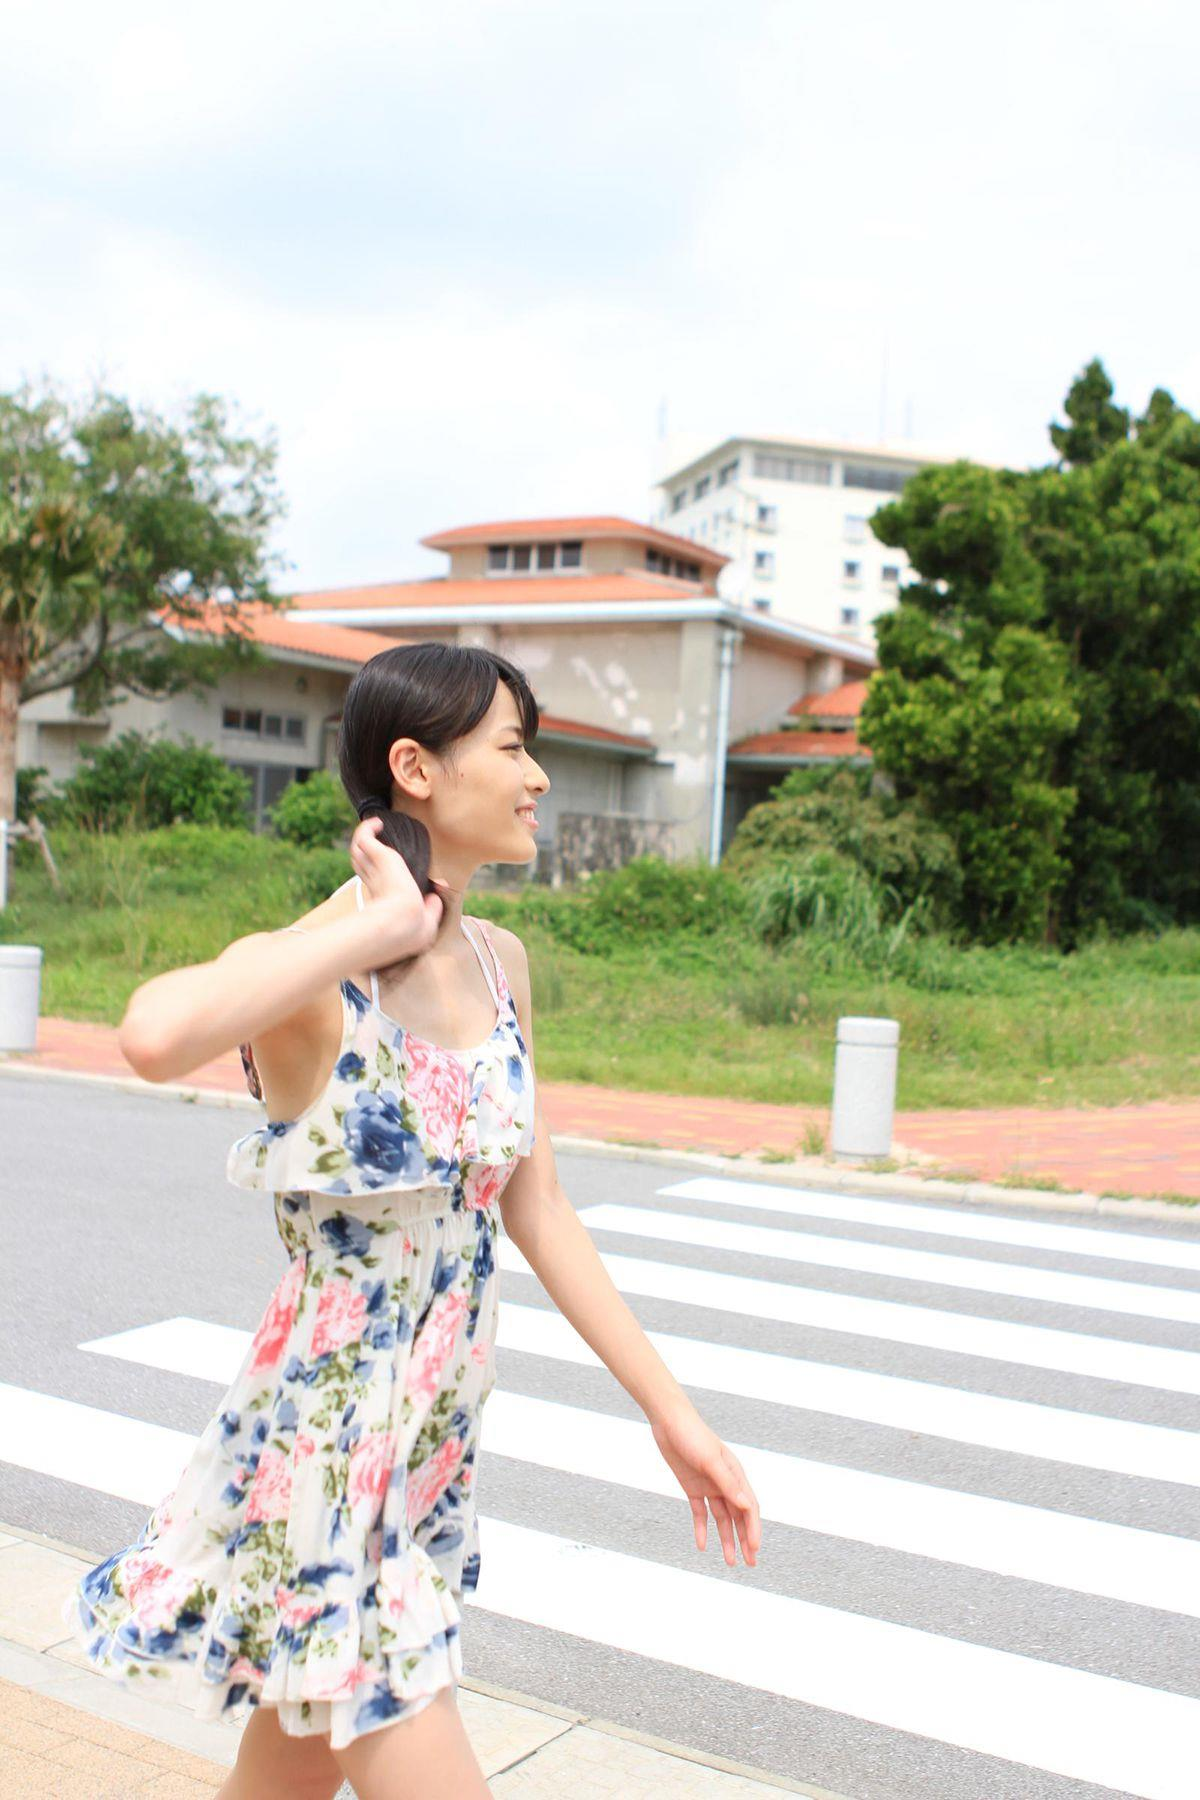 矢島舞美 エロ画像 24